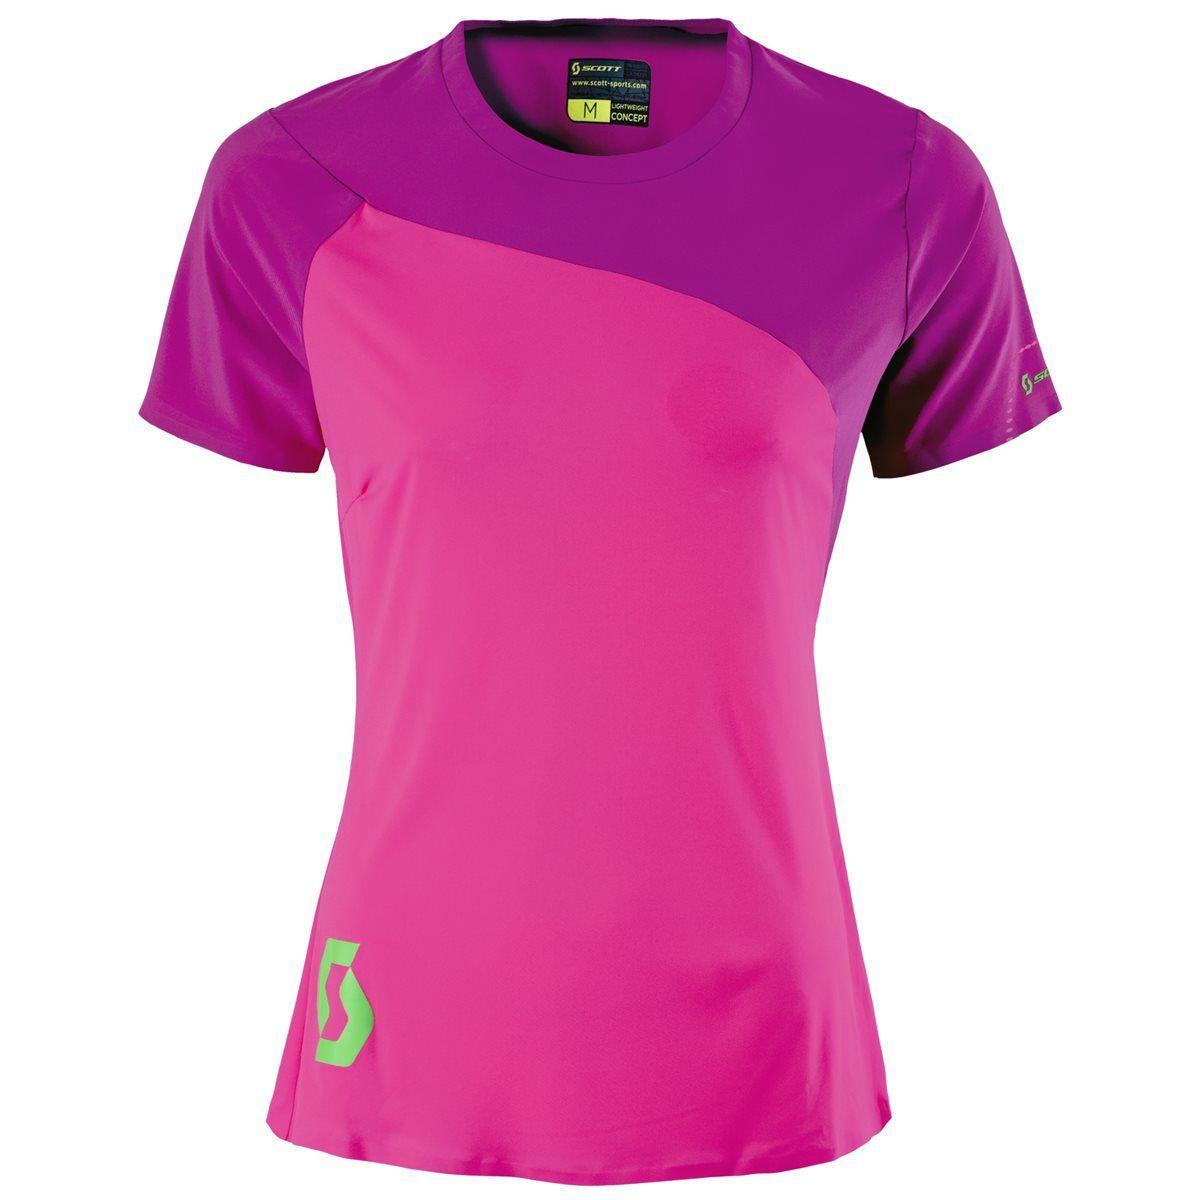 Scott Trail Tech 10 Womens Short Sleeve Cycling Jersey  fd42eef14